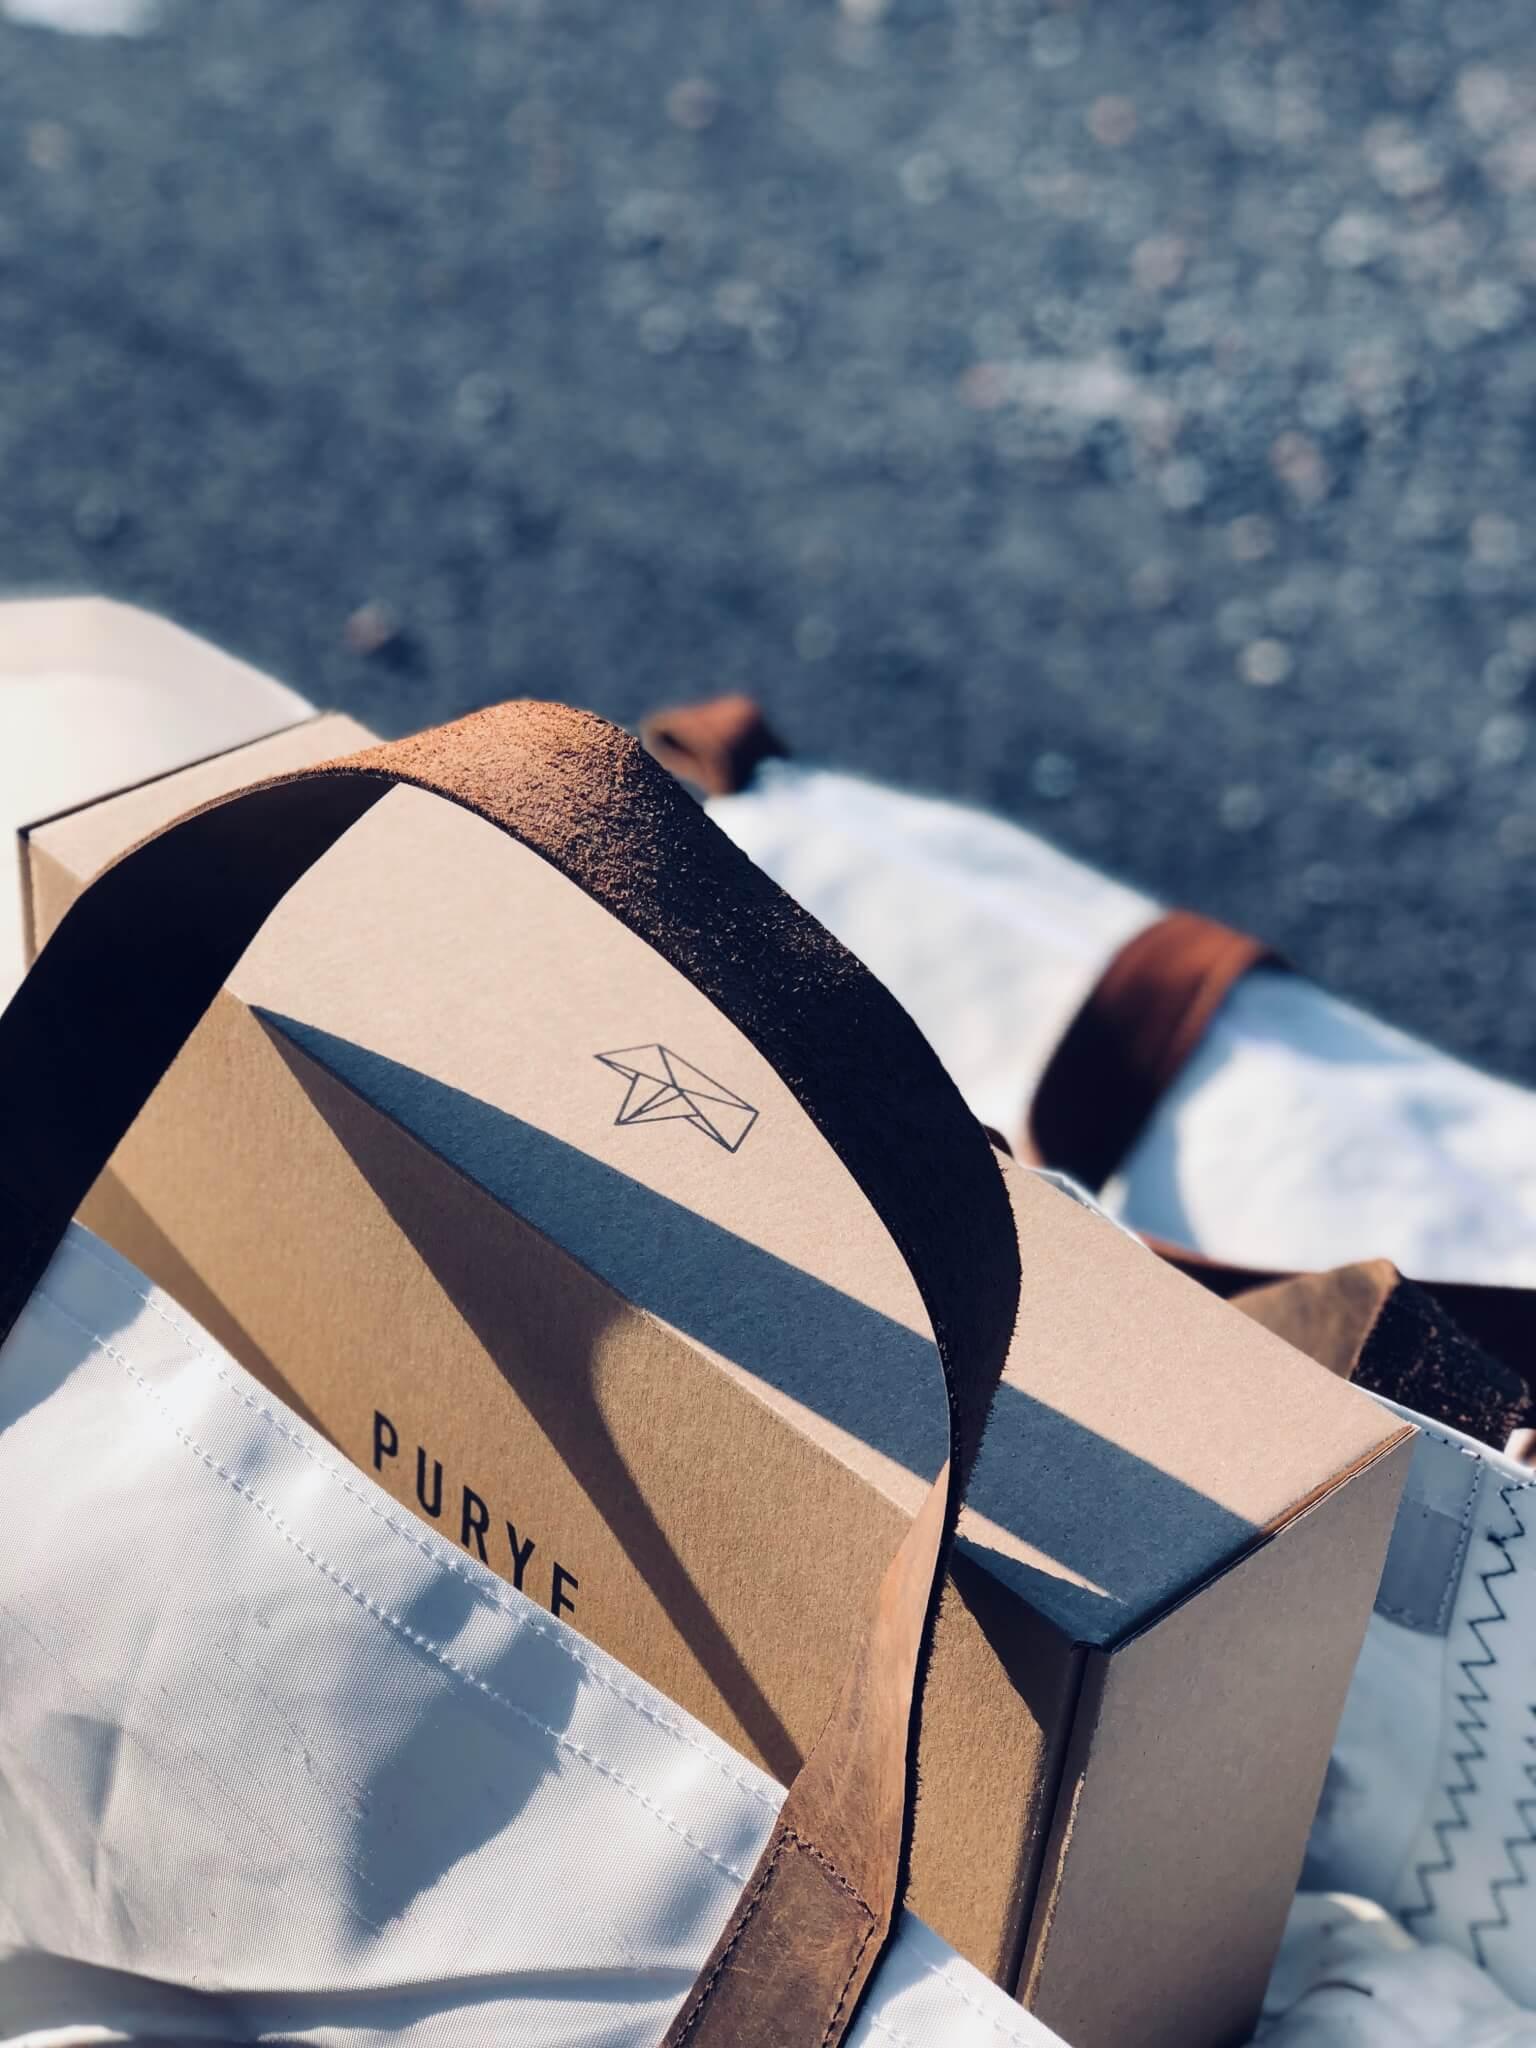 embalajes de cartón de purye clothing